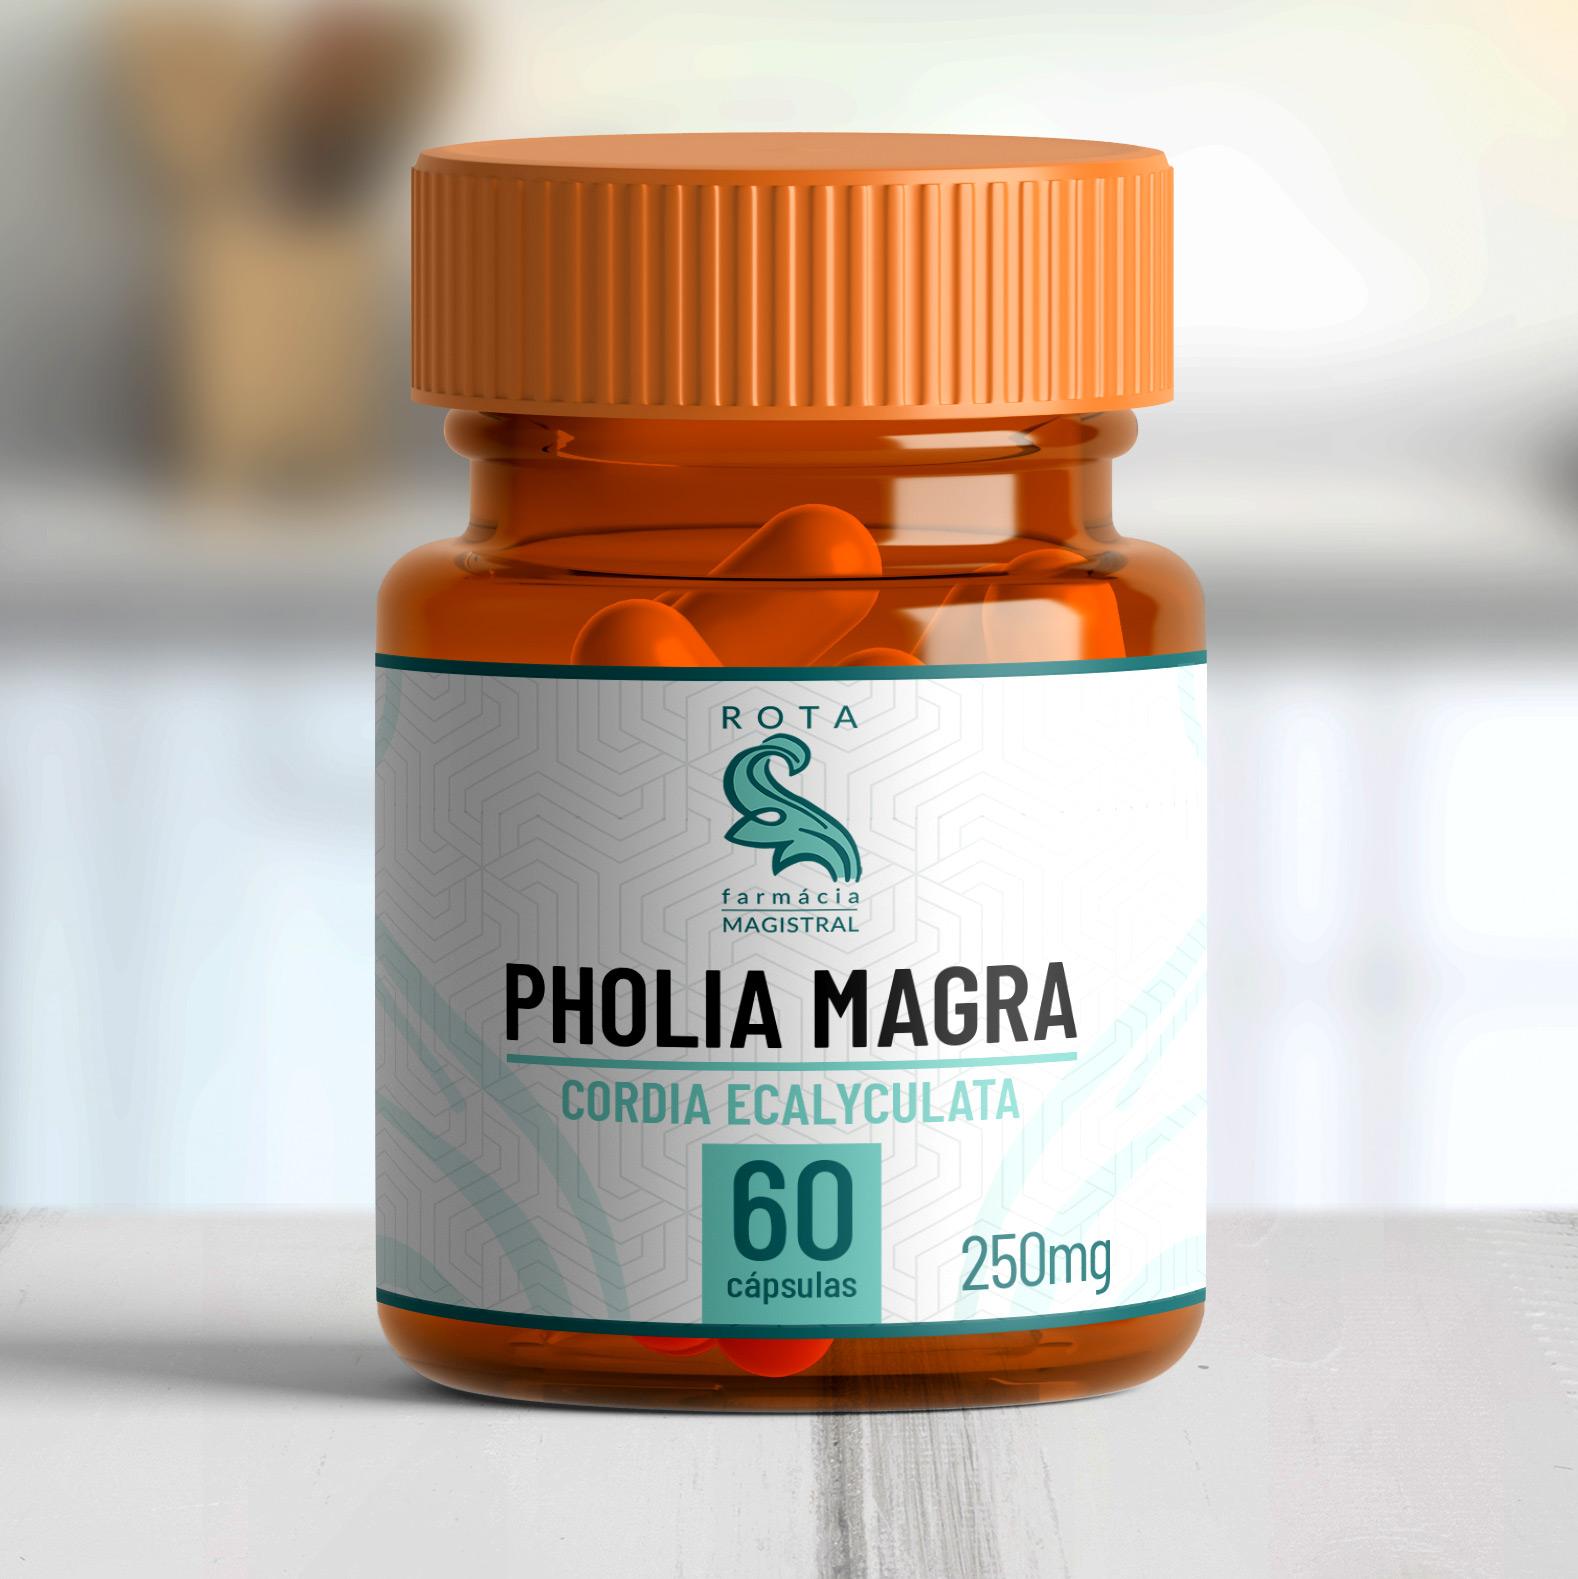 Pholia Magra ® (Cordia Ecalyculata) 250mg 60 cápsulas